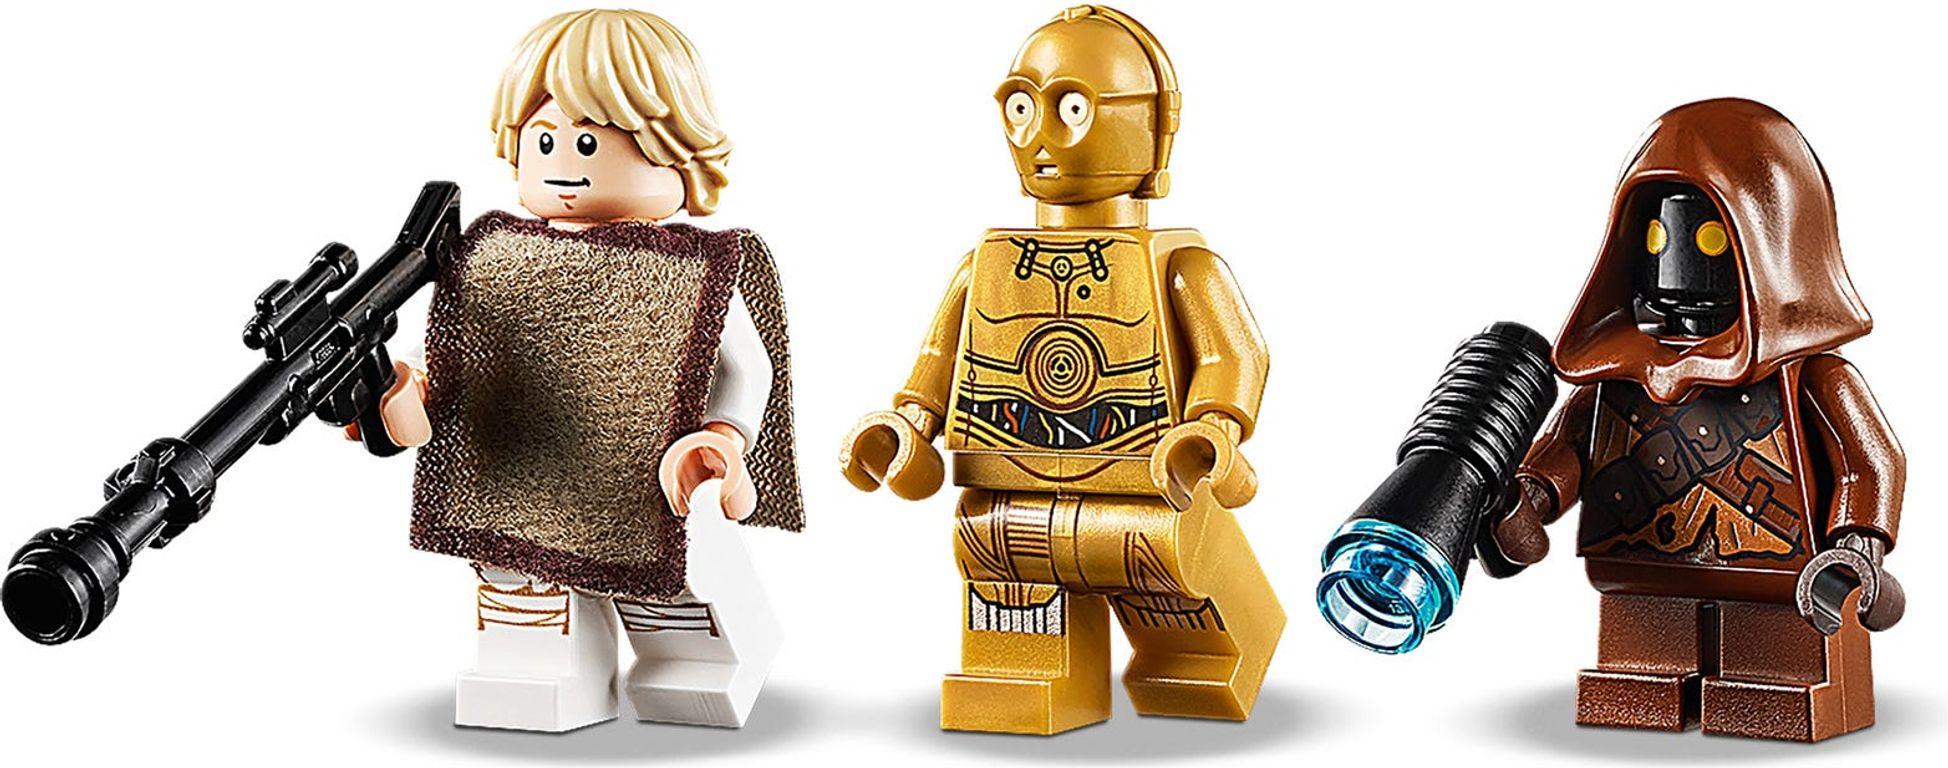 Luke Skywalker's Landspeeder™ minifigures